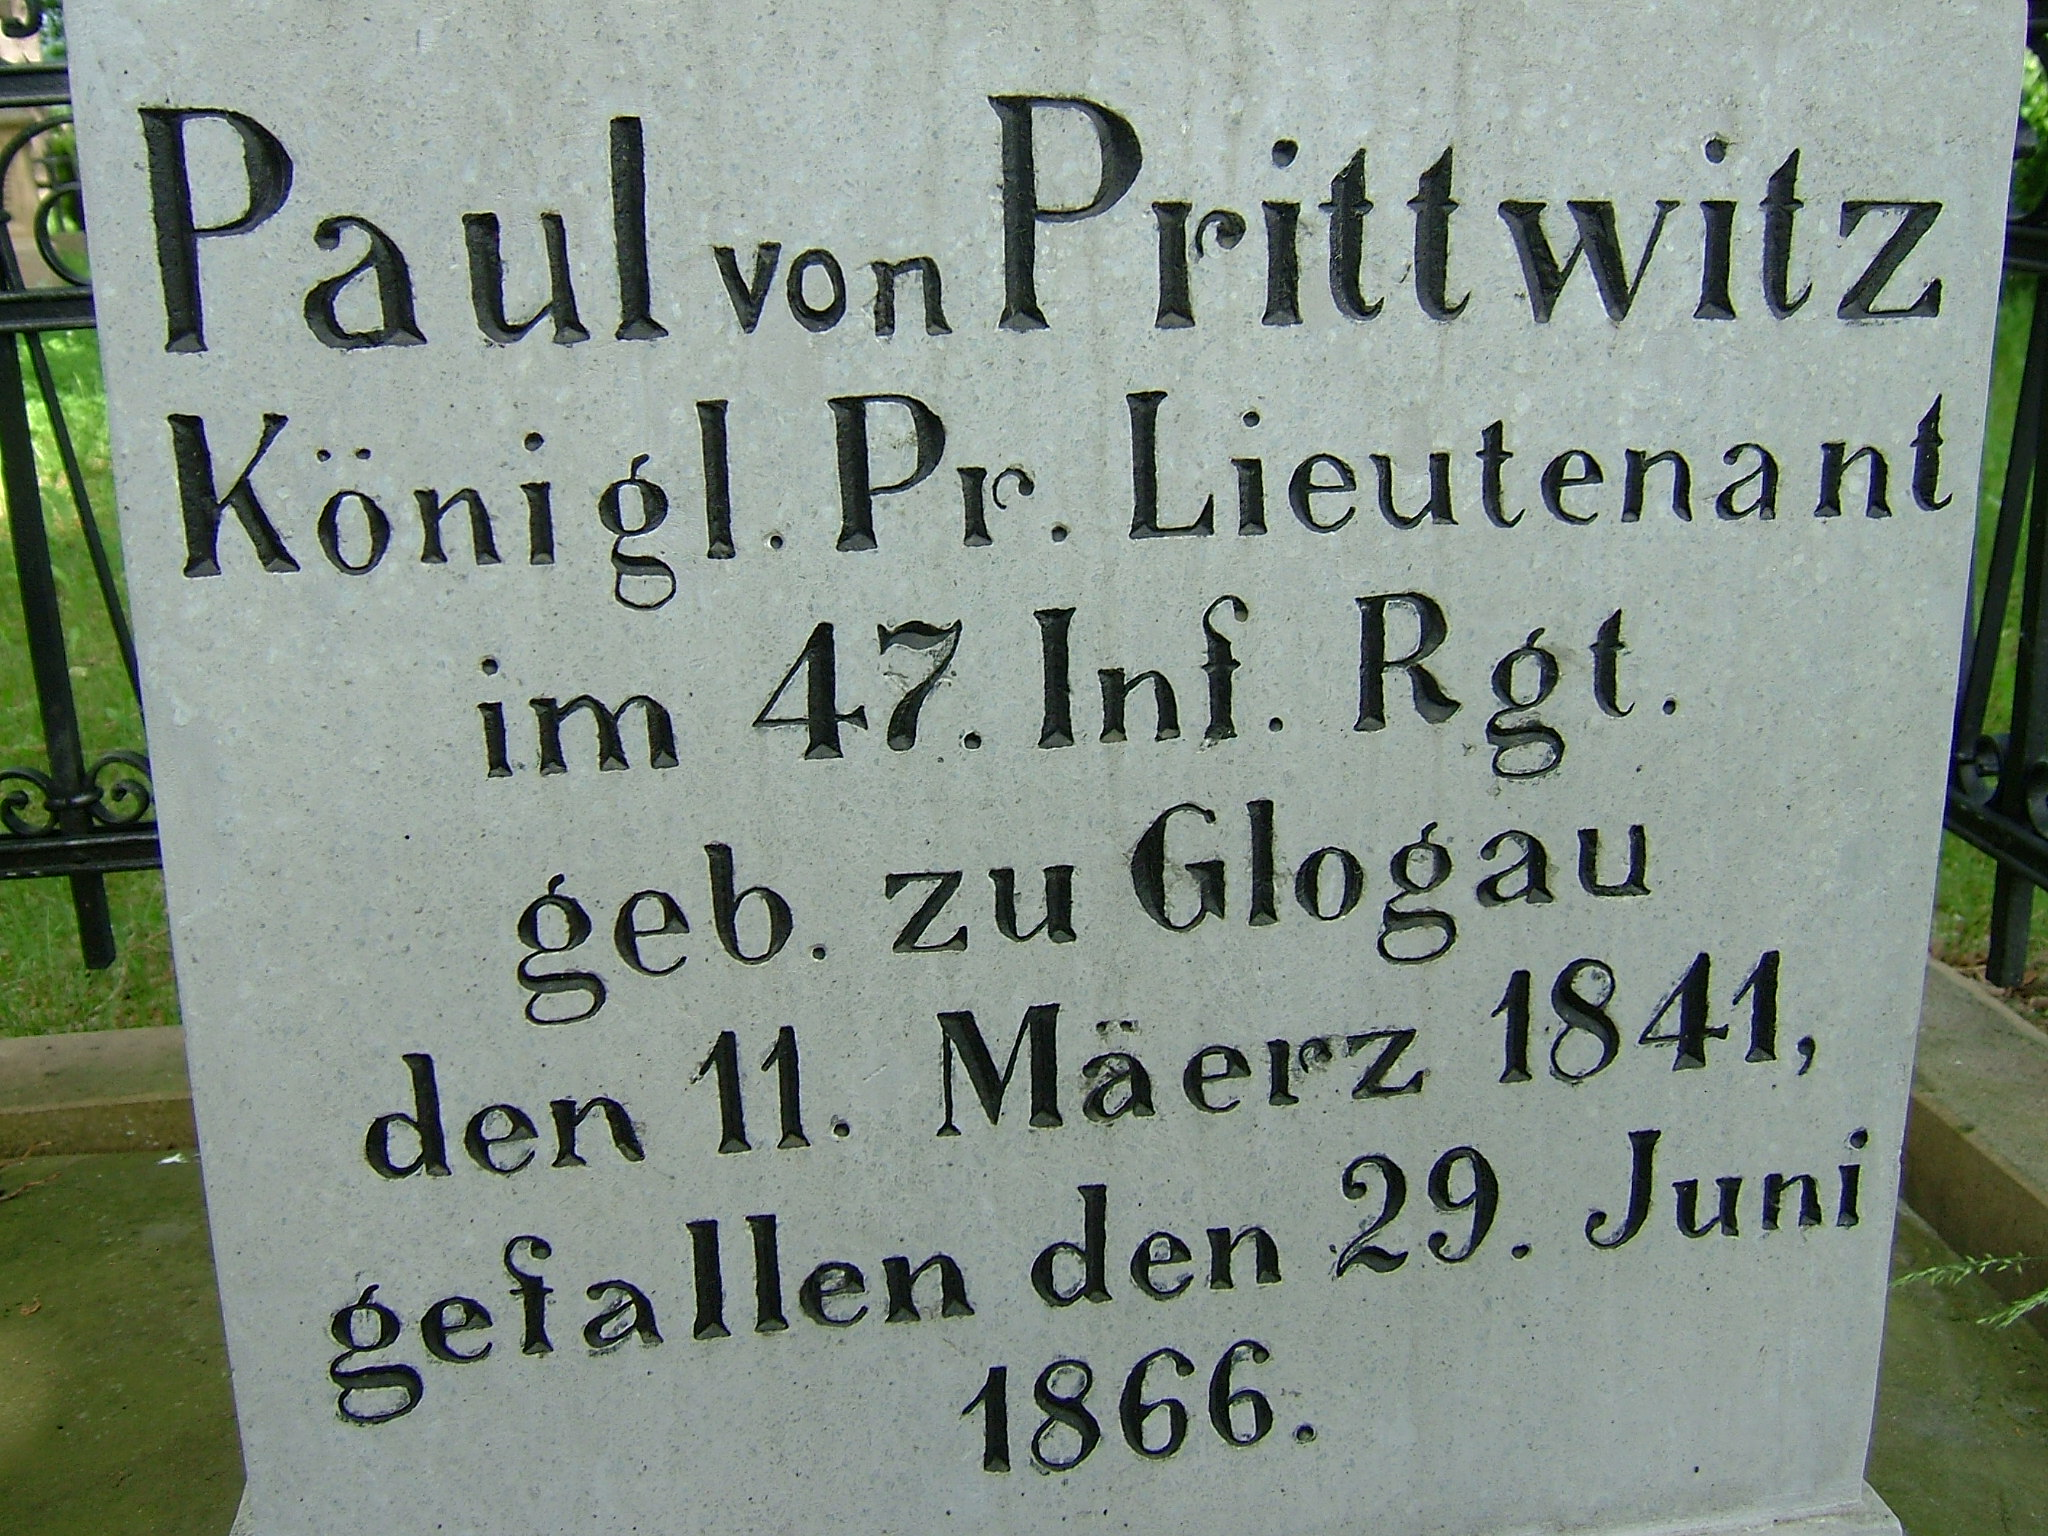 Pruský poručík Paul von Prittwitz